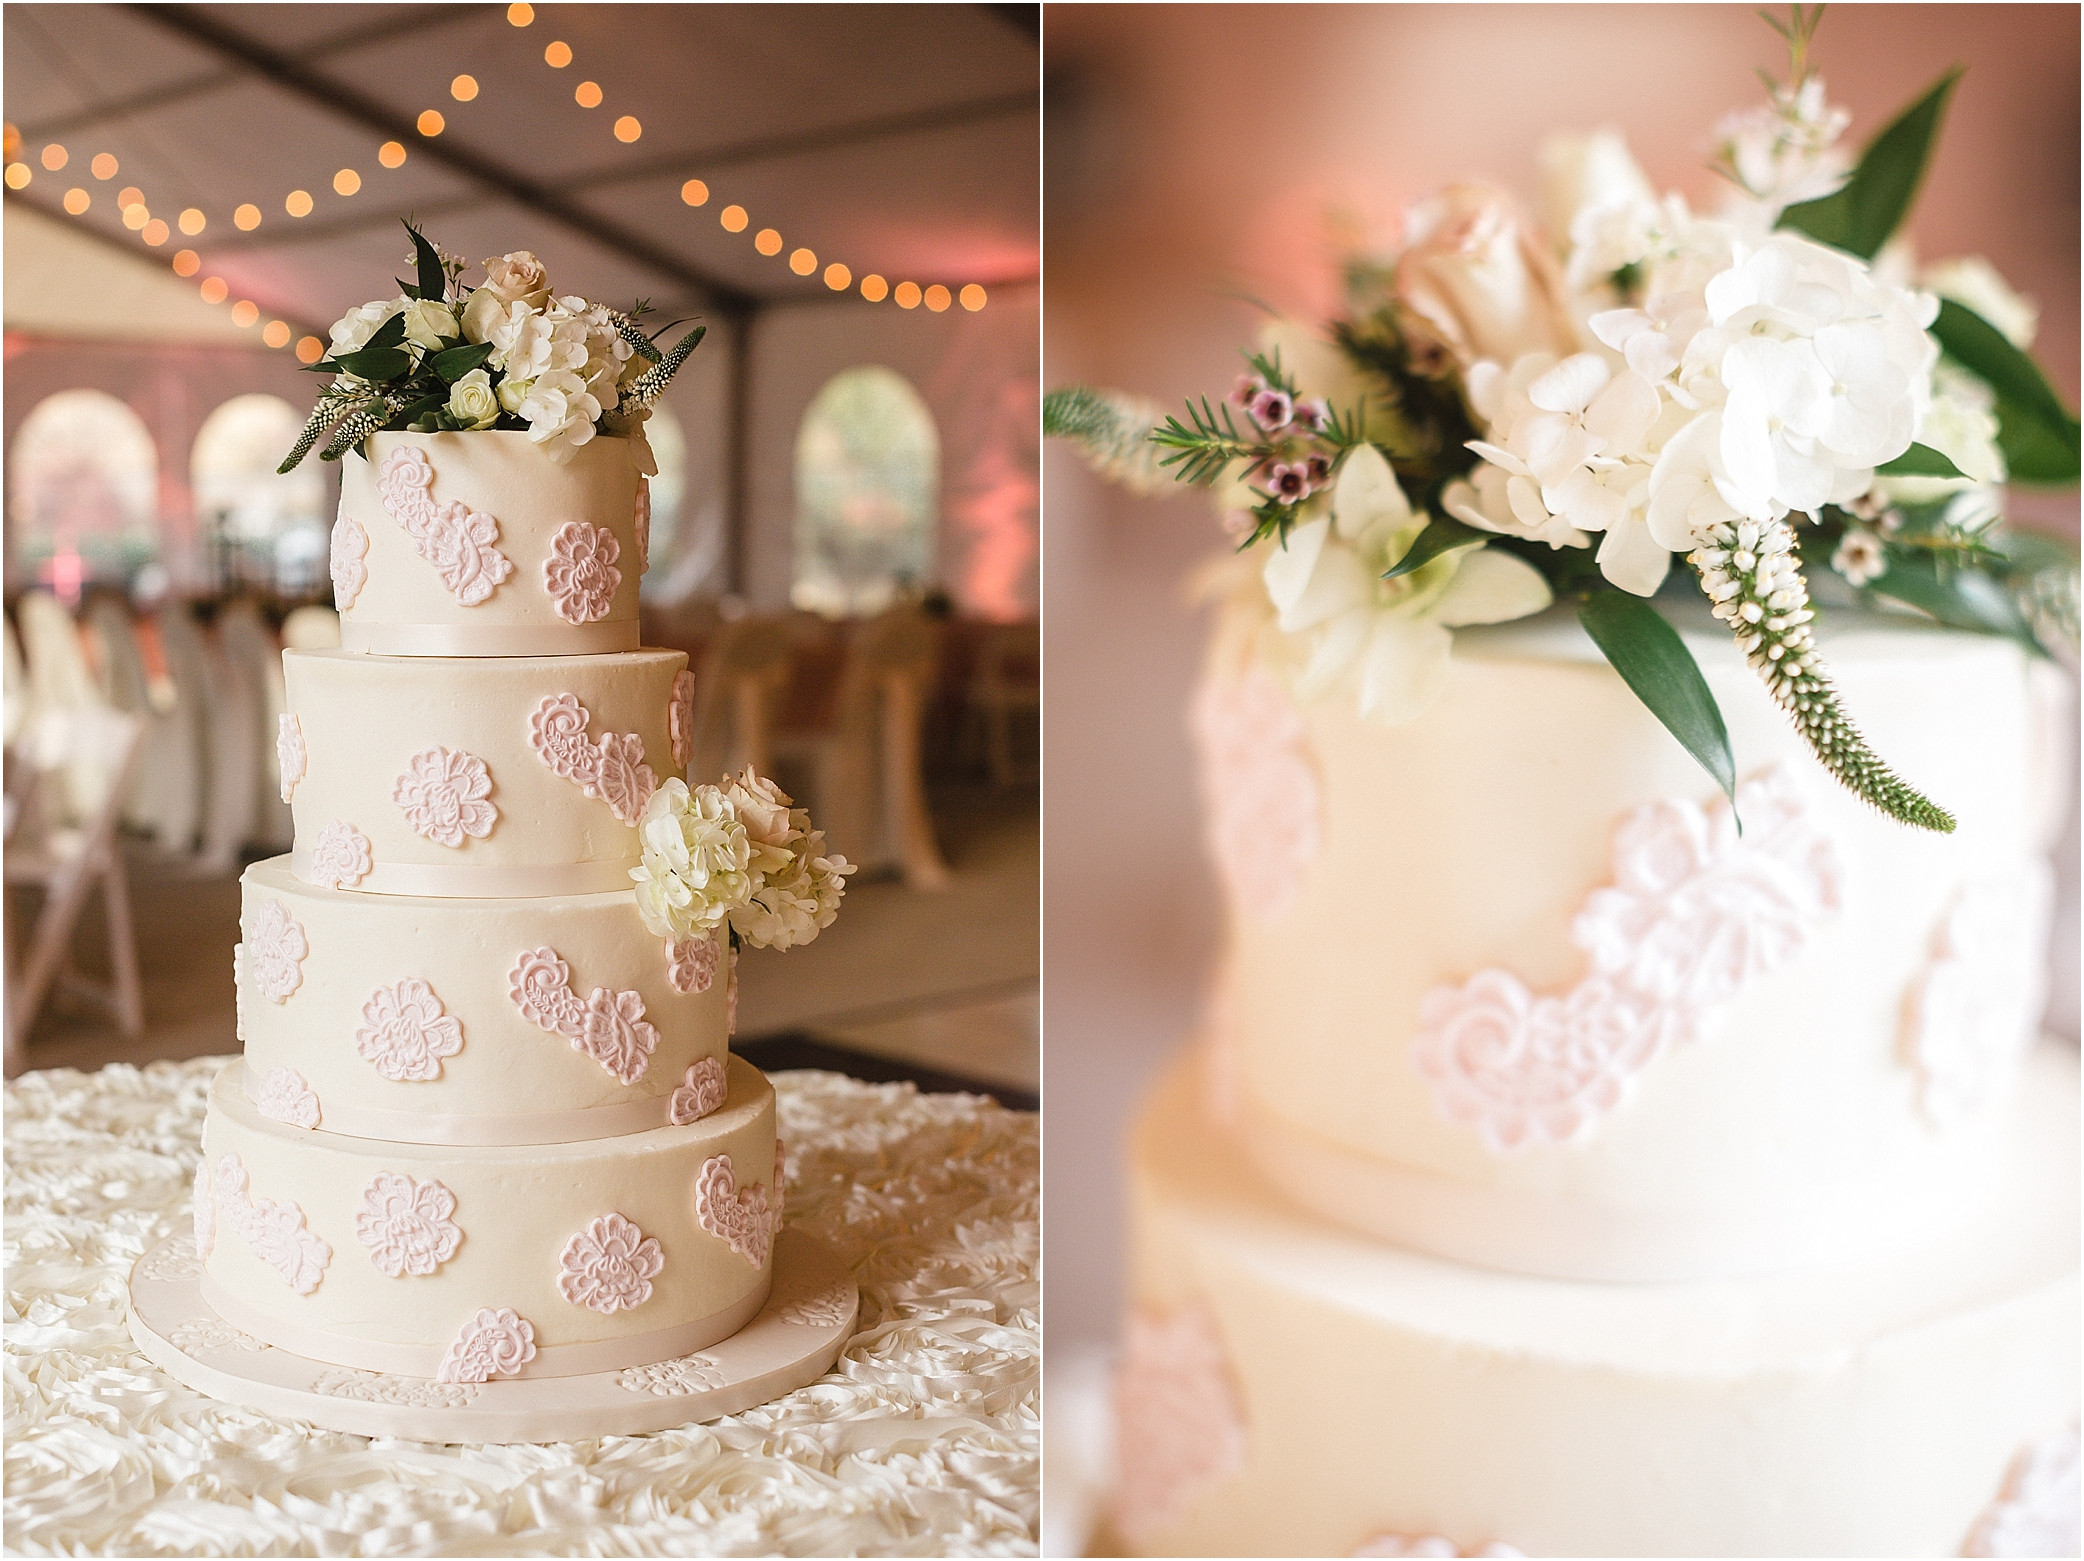 Wedding Cakes Knoxville  Knoxville wedding cakes idea in 2017